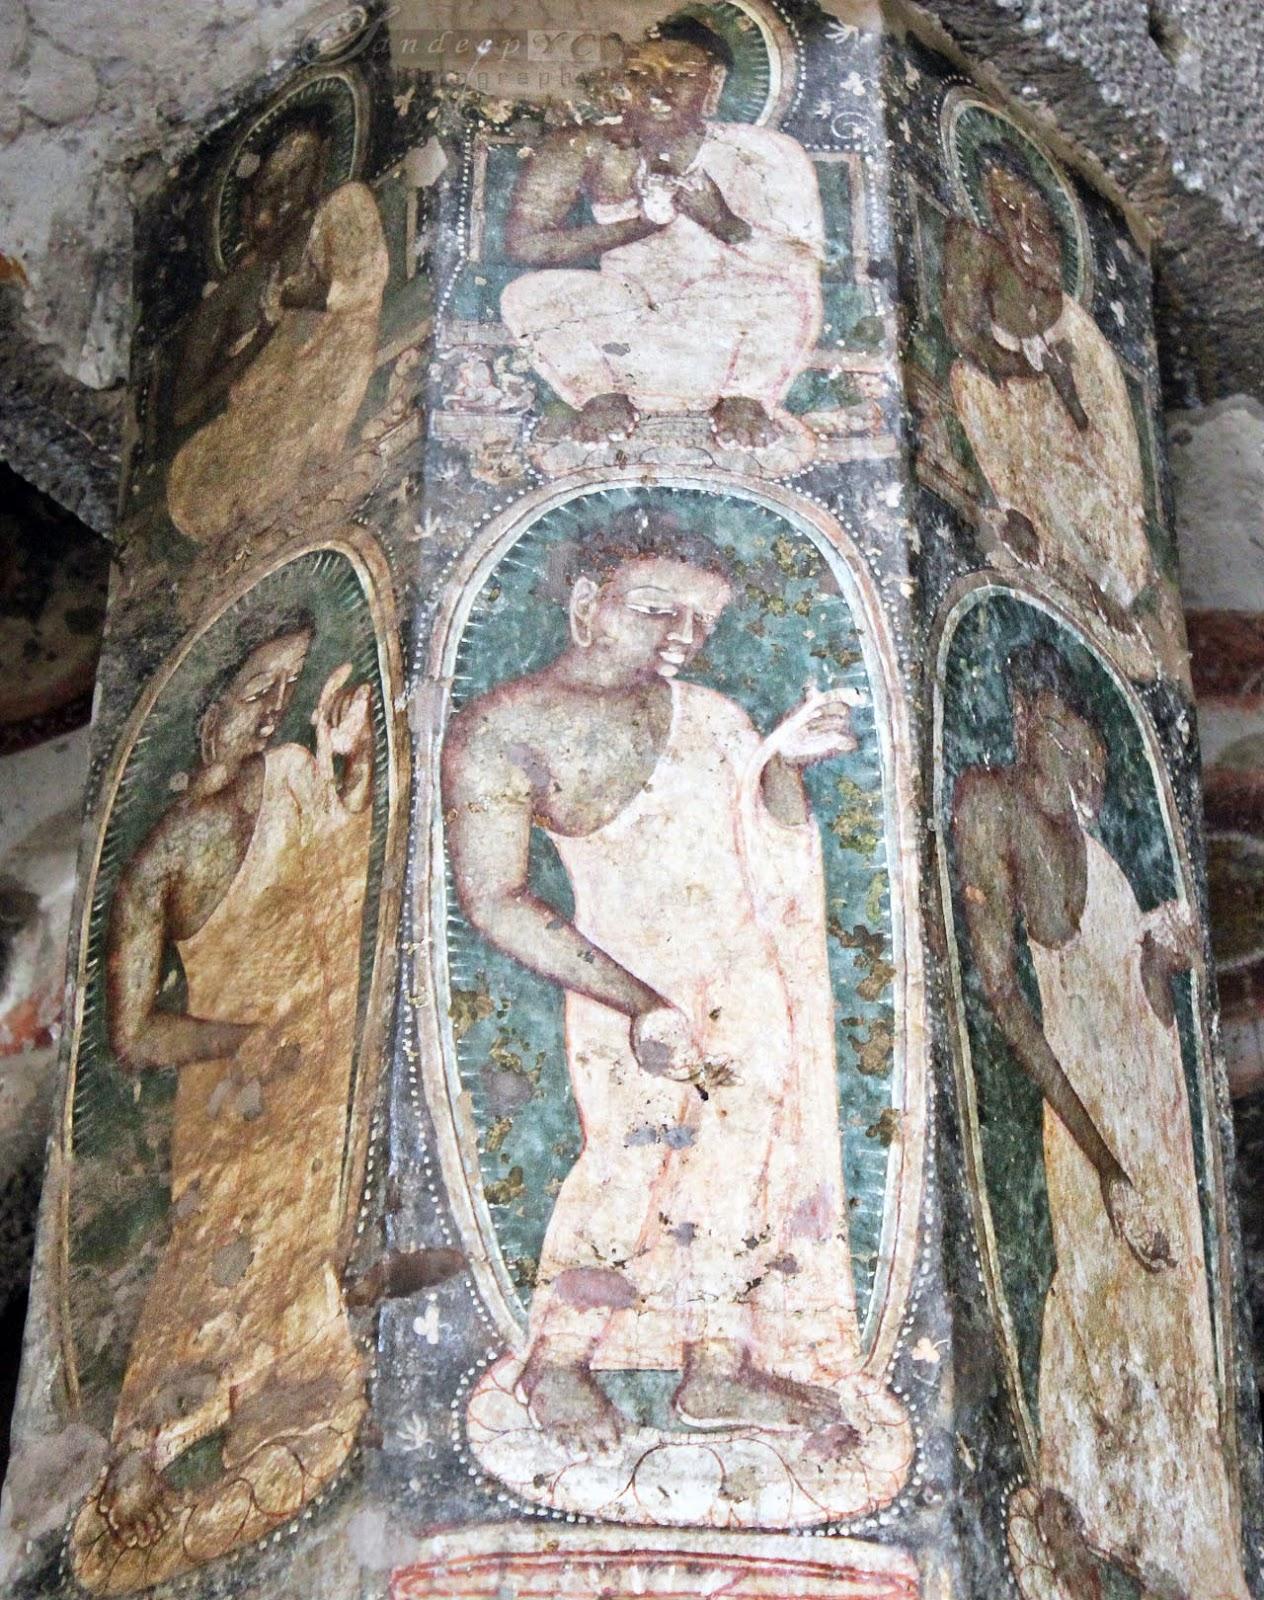 Buddhist images on the octagonal pillars